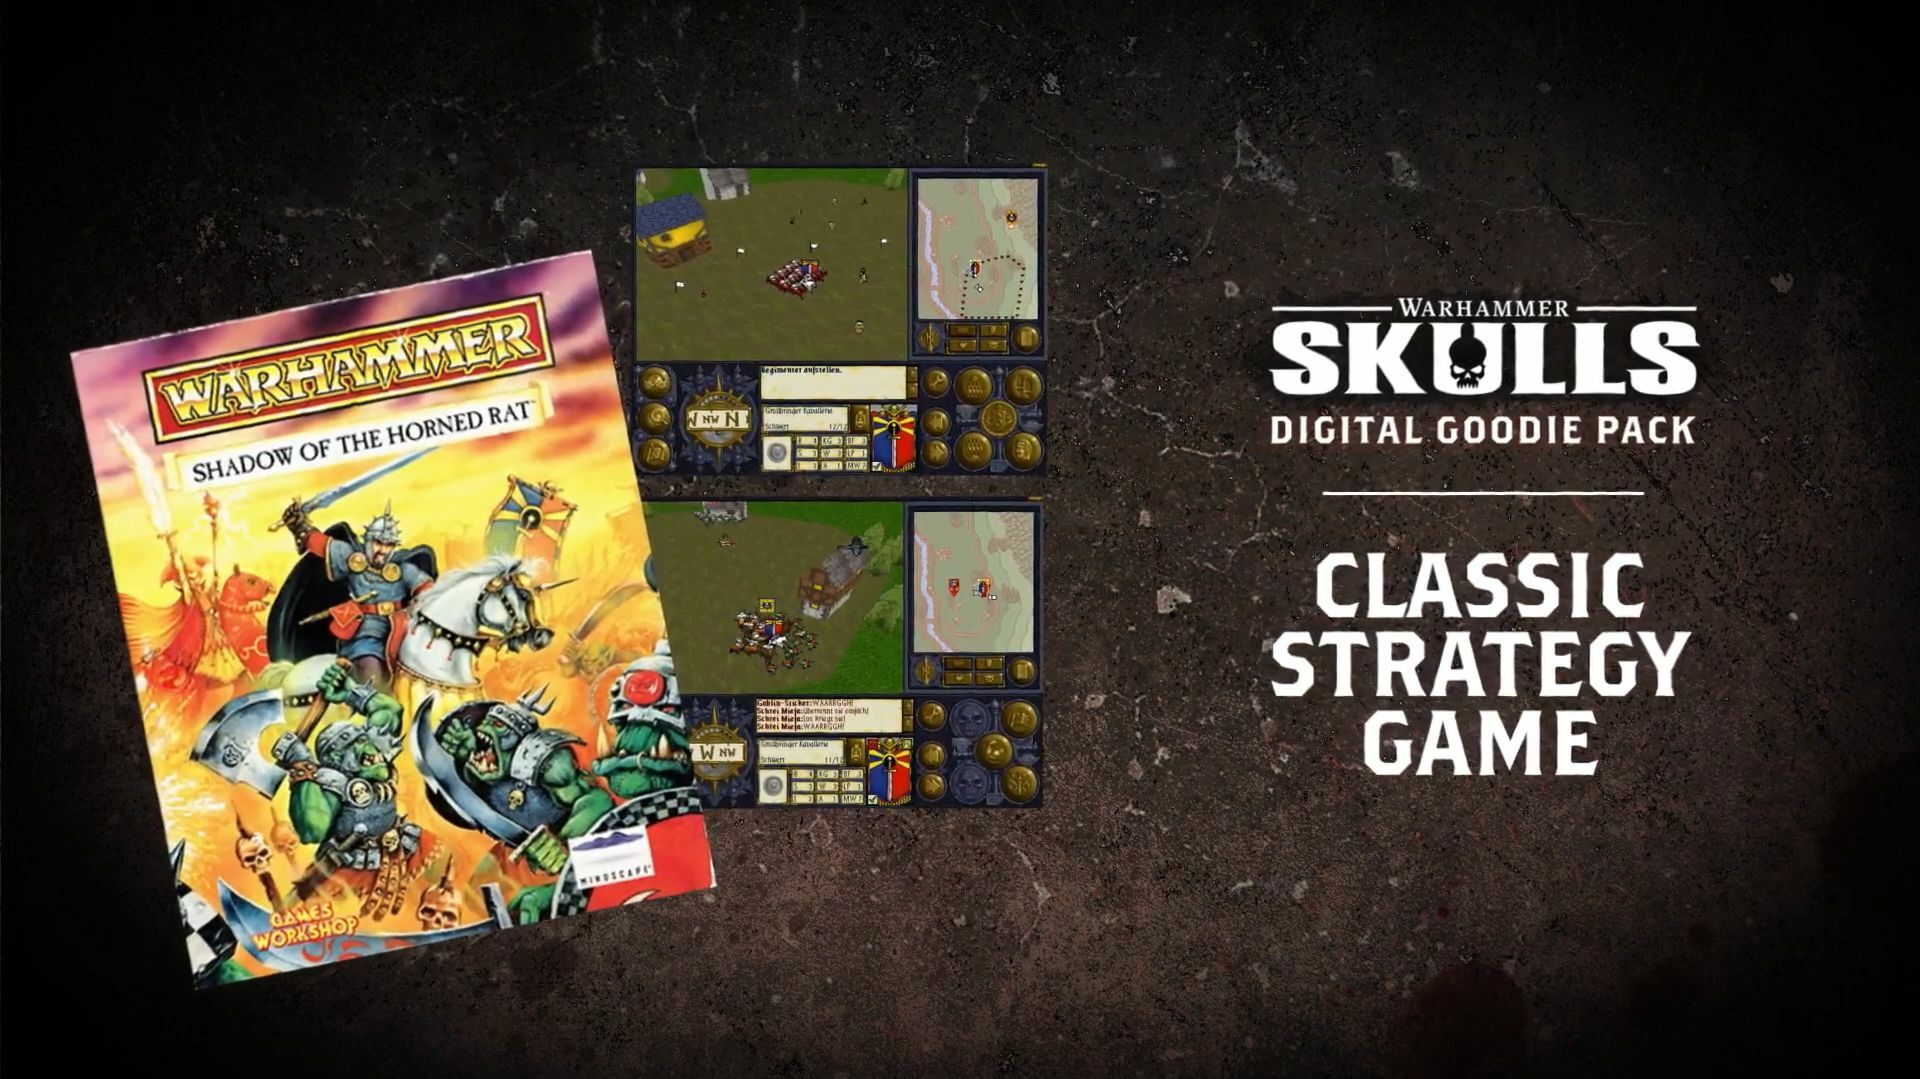 Claim Warhammer: Shadow of the Horned Rat + Warhammer Skulls Digital Goodie Pack for free